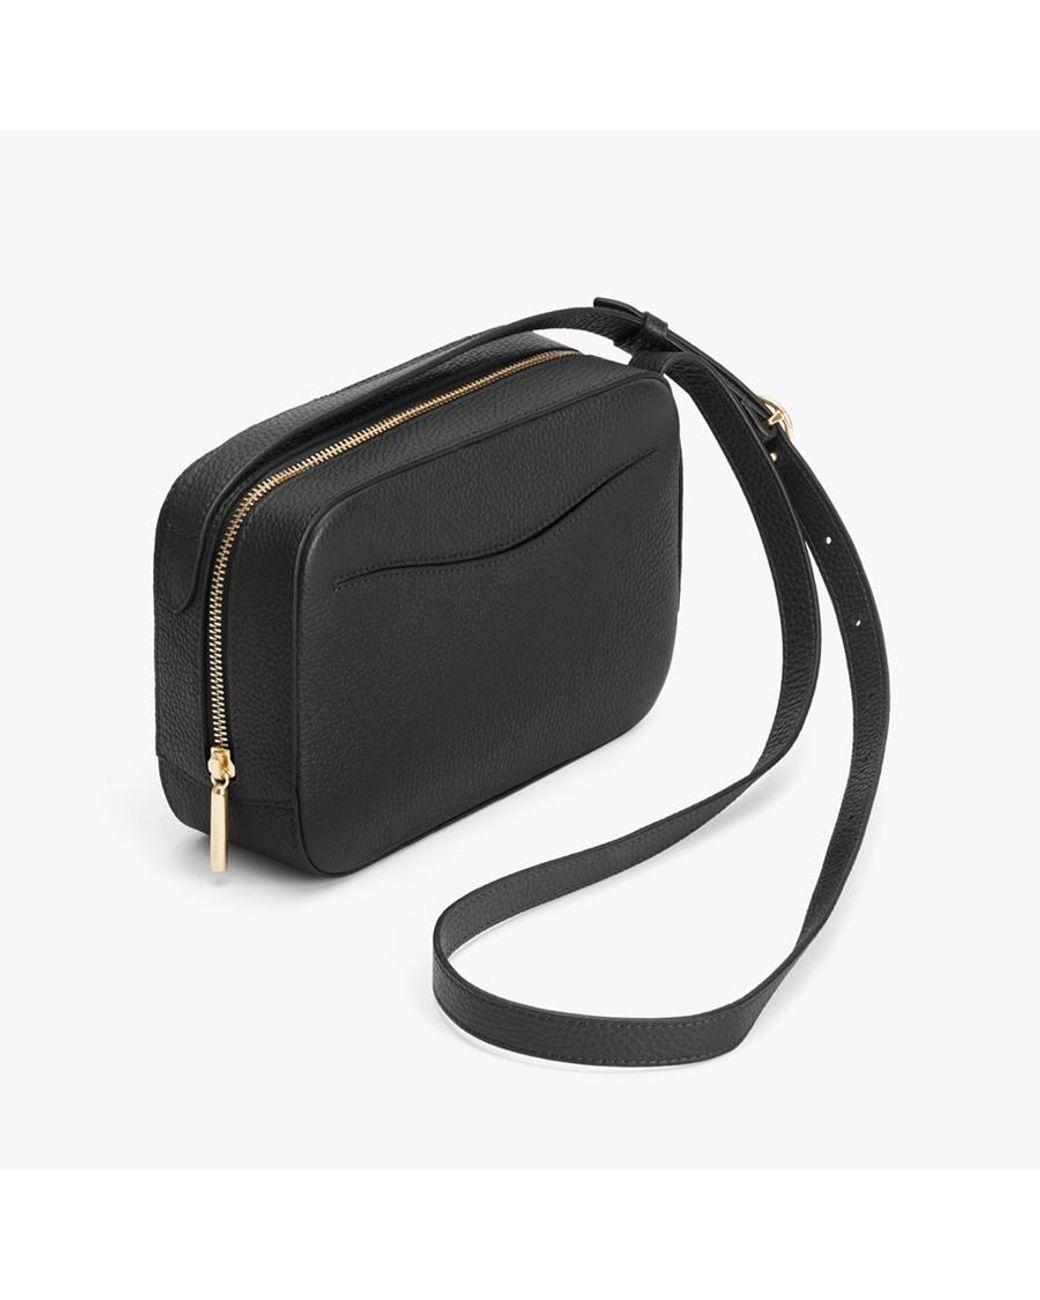 Turkey Diamond Jacket Handbag Purse Luggage Backpack Zipper Pull Charm